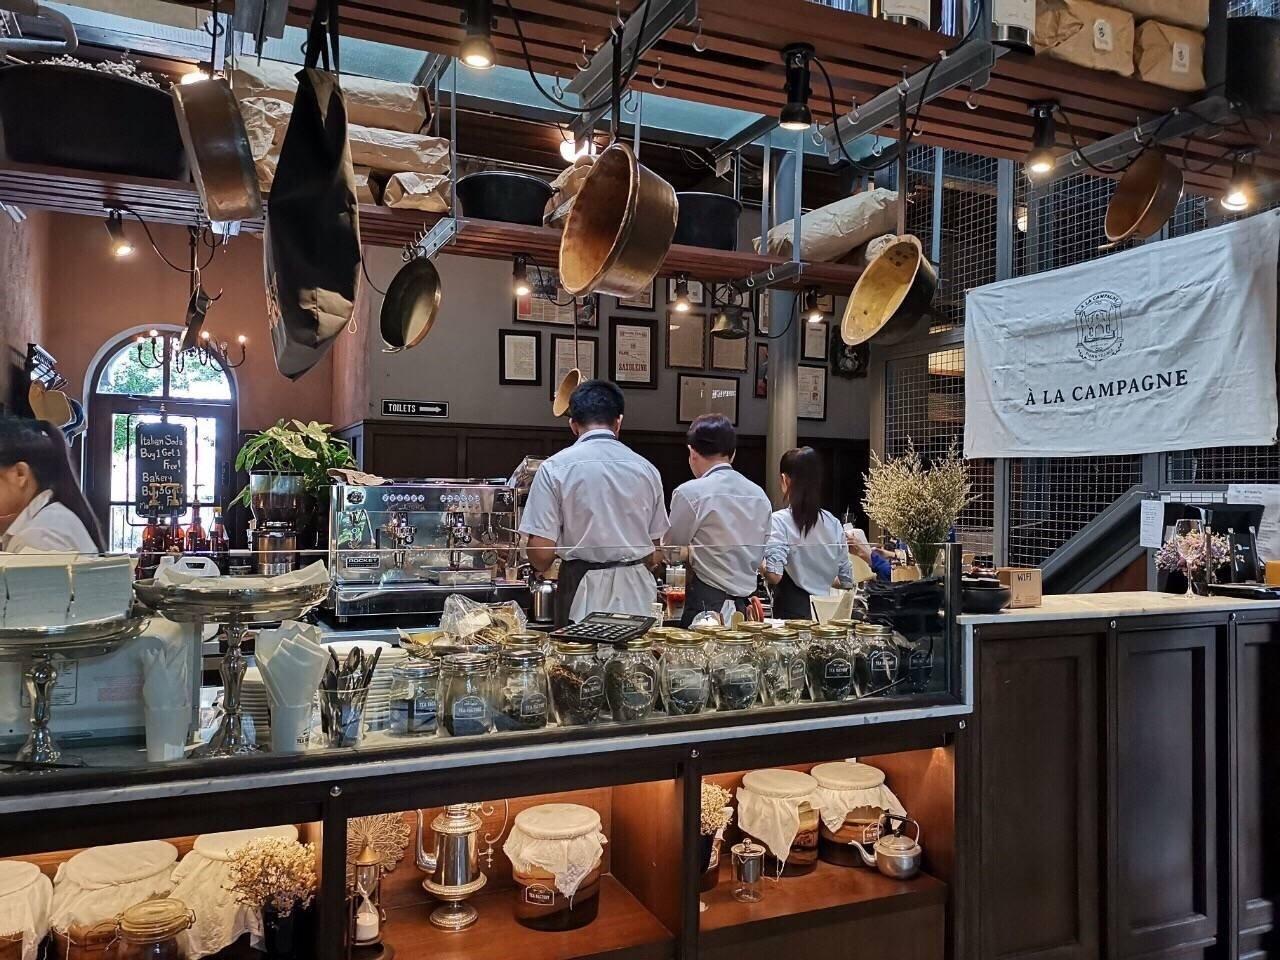 Tea Factory A La Campagne